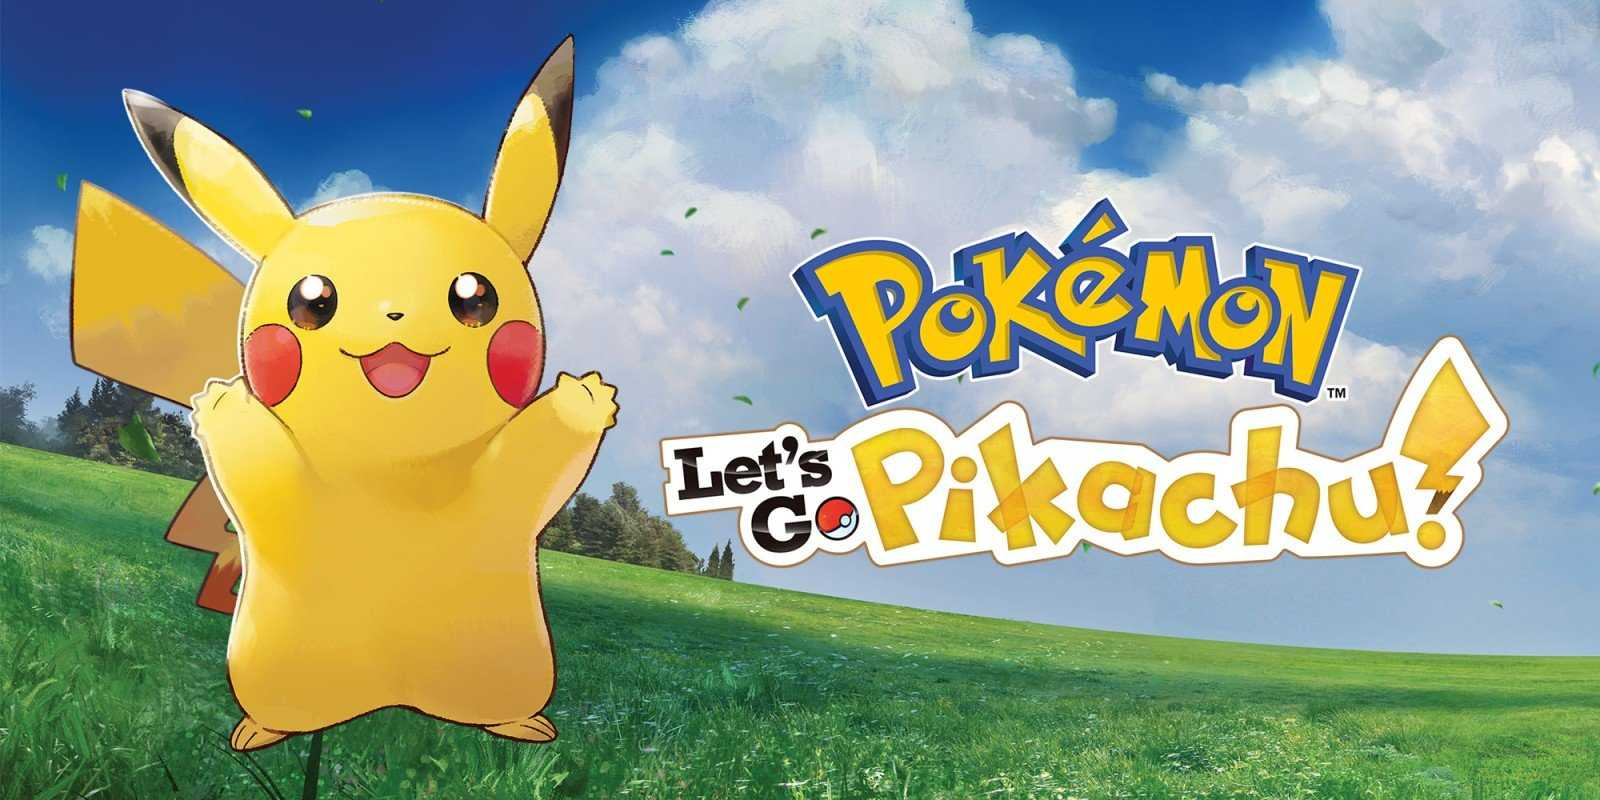 Pokémon: Let